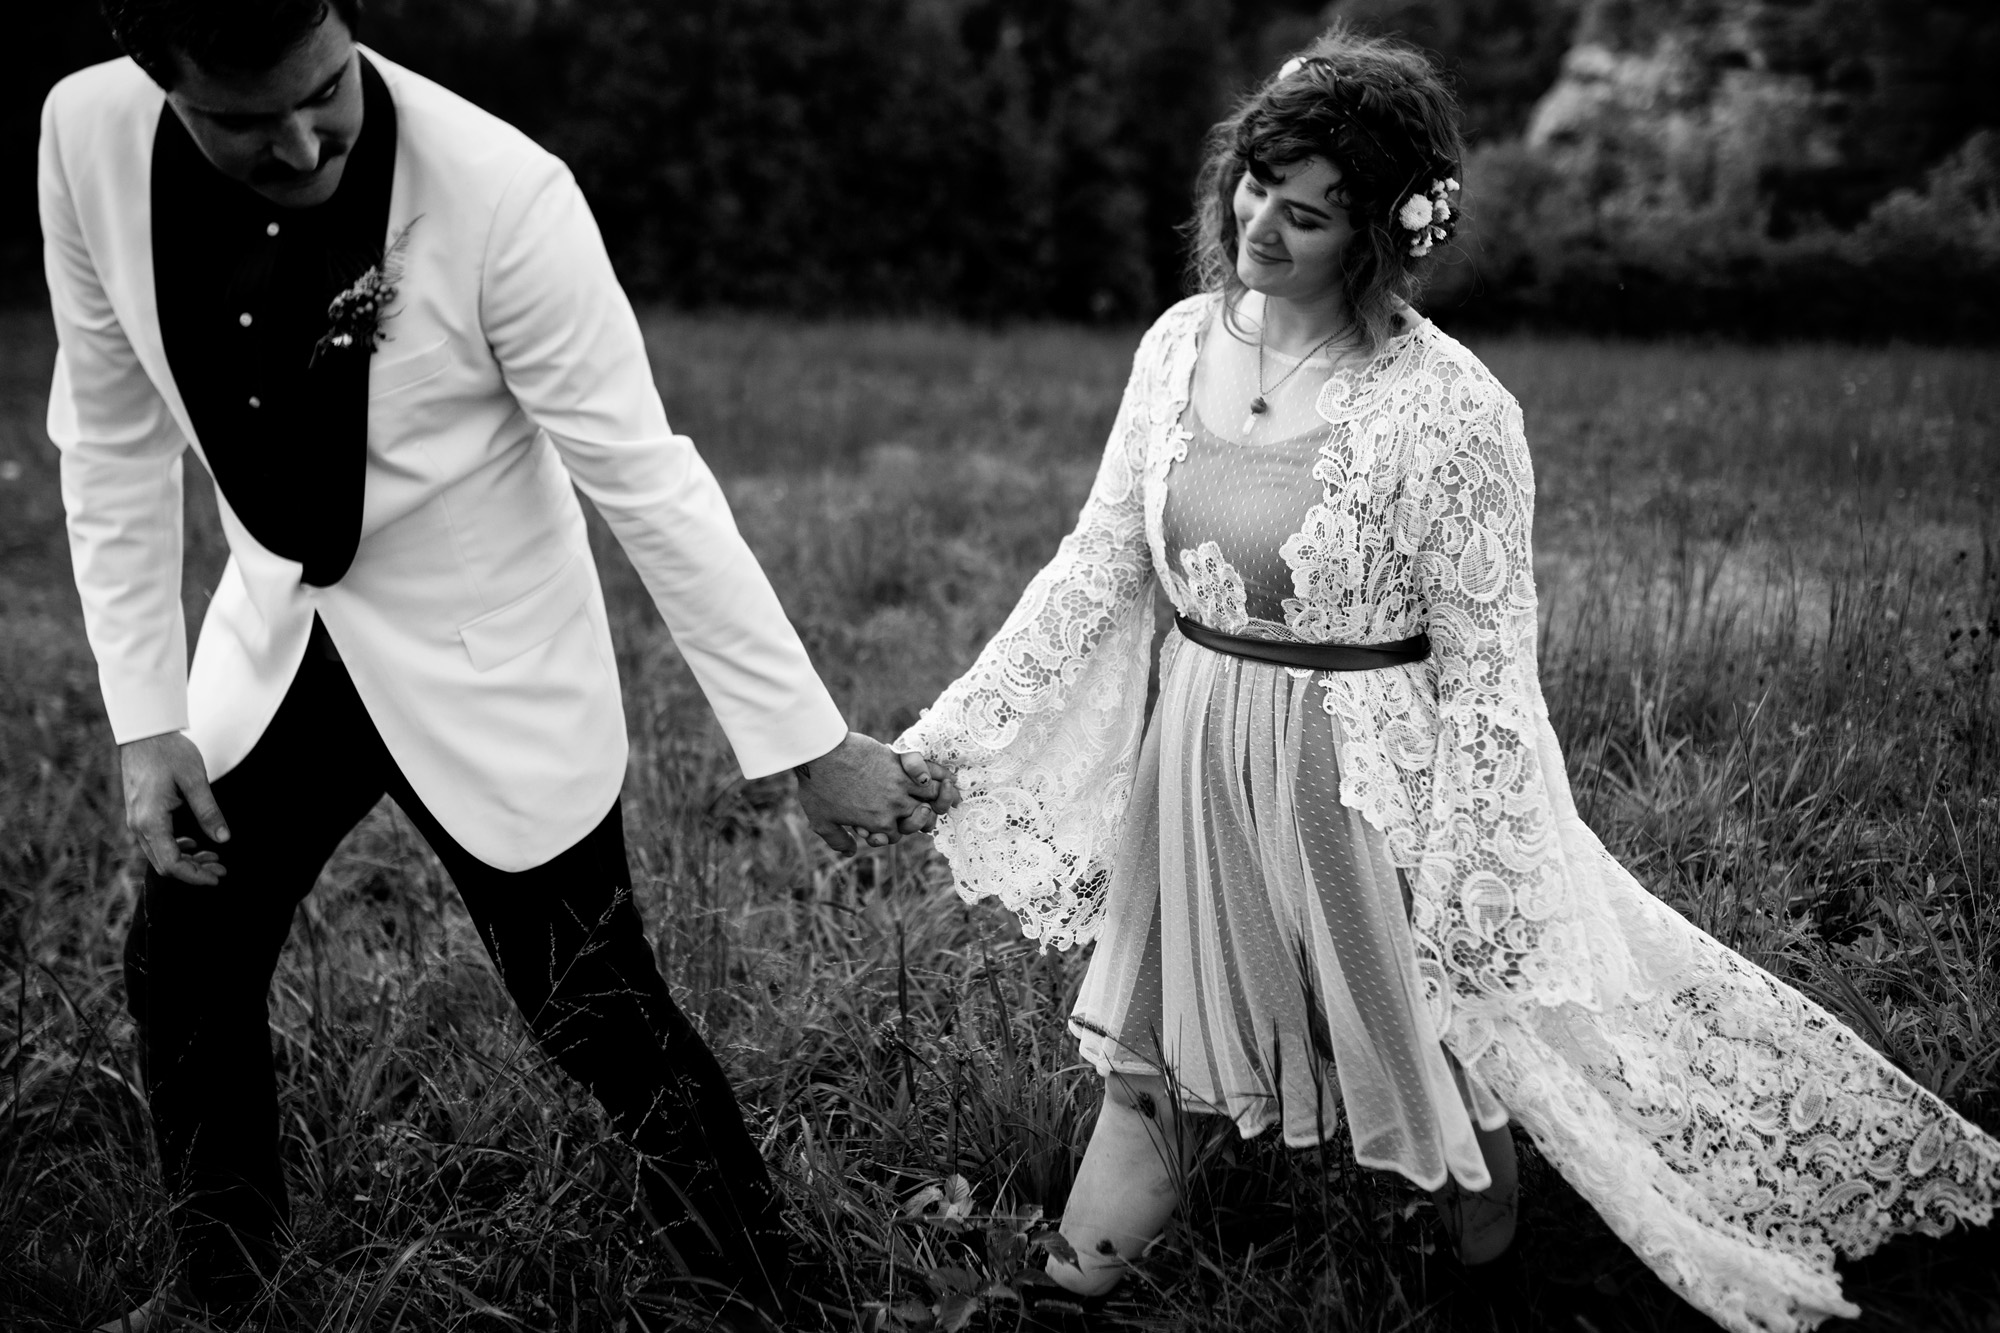 Seriously_Sabrina_Photography_Red_River_Gorge_Kentucky_Wedding_ShawnDana155.jpg